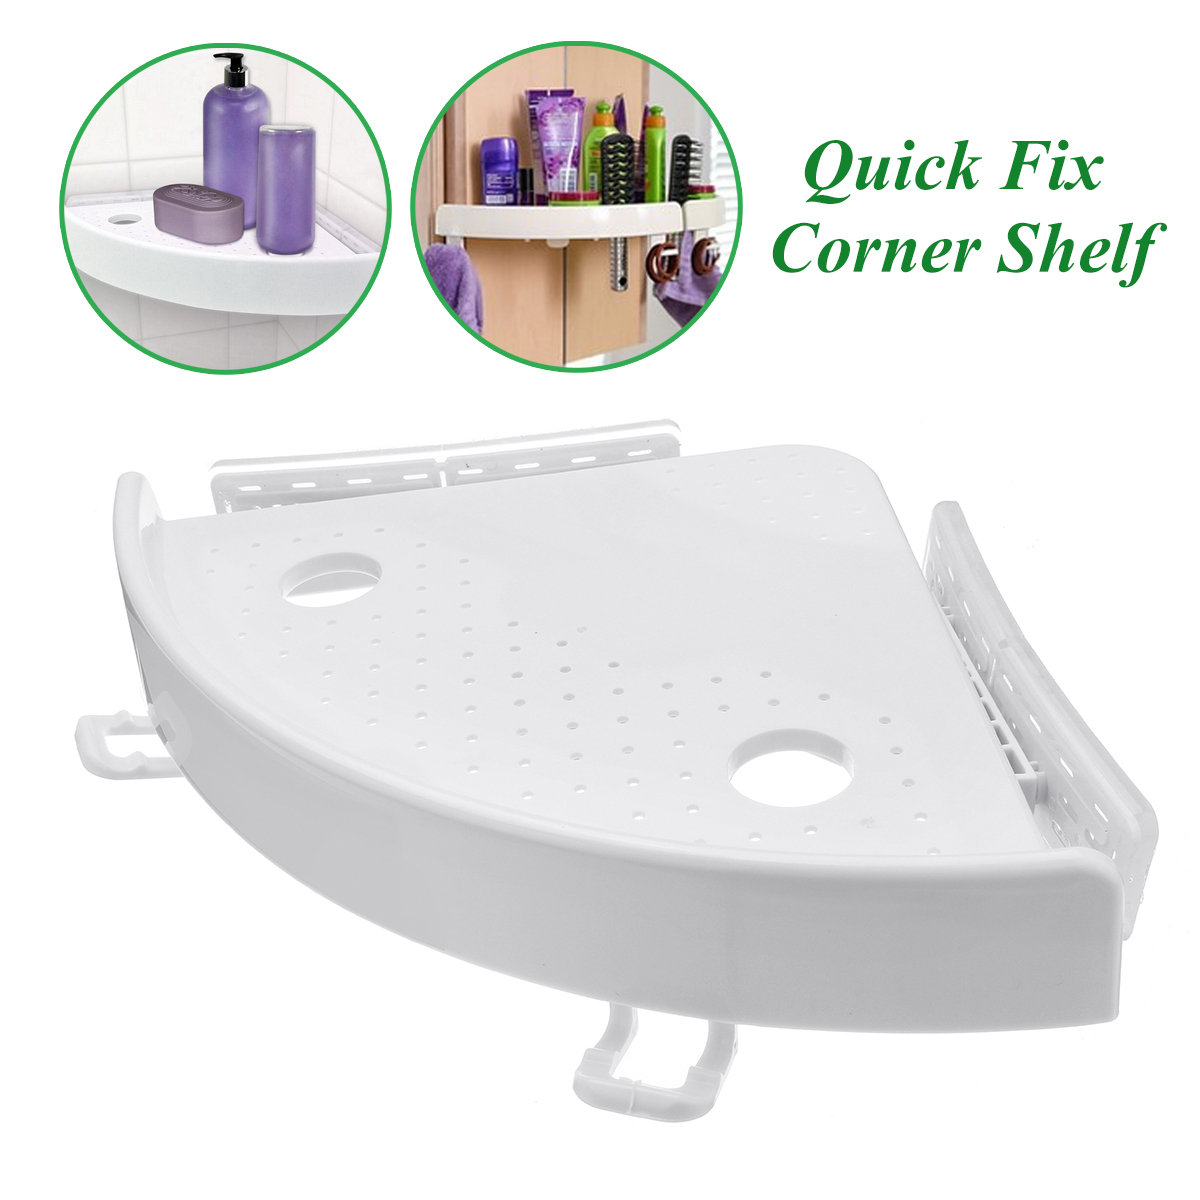 Bathroom Kitchen Corner Shelf Wall Suction Cup Bathroom